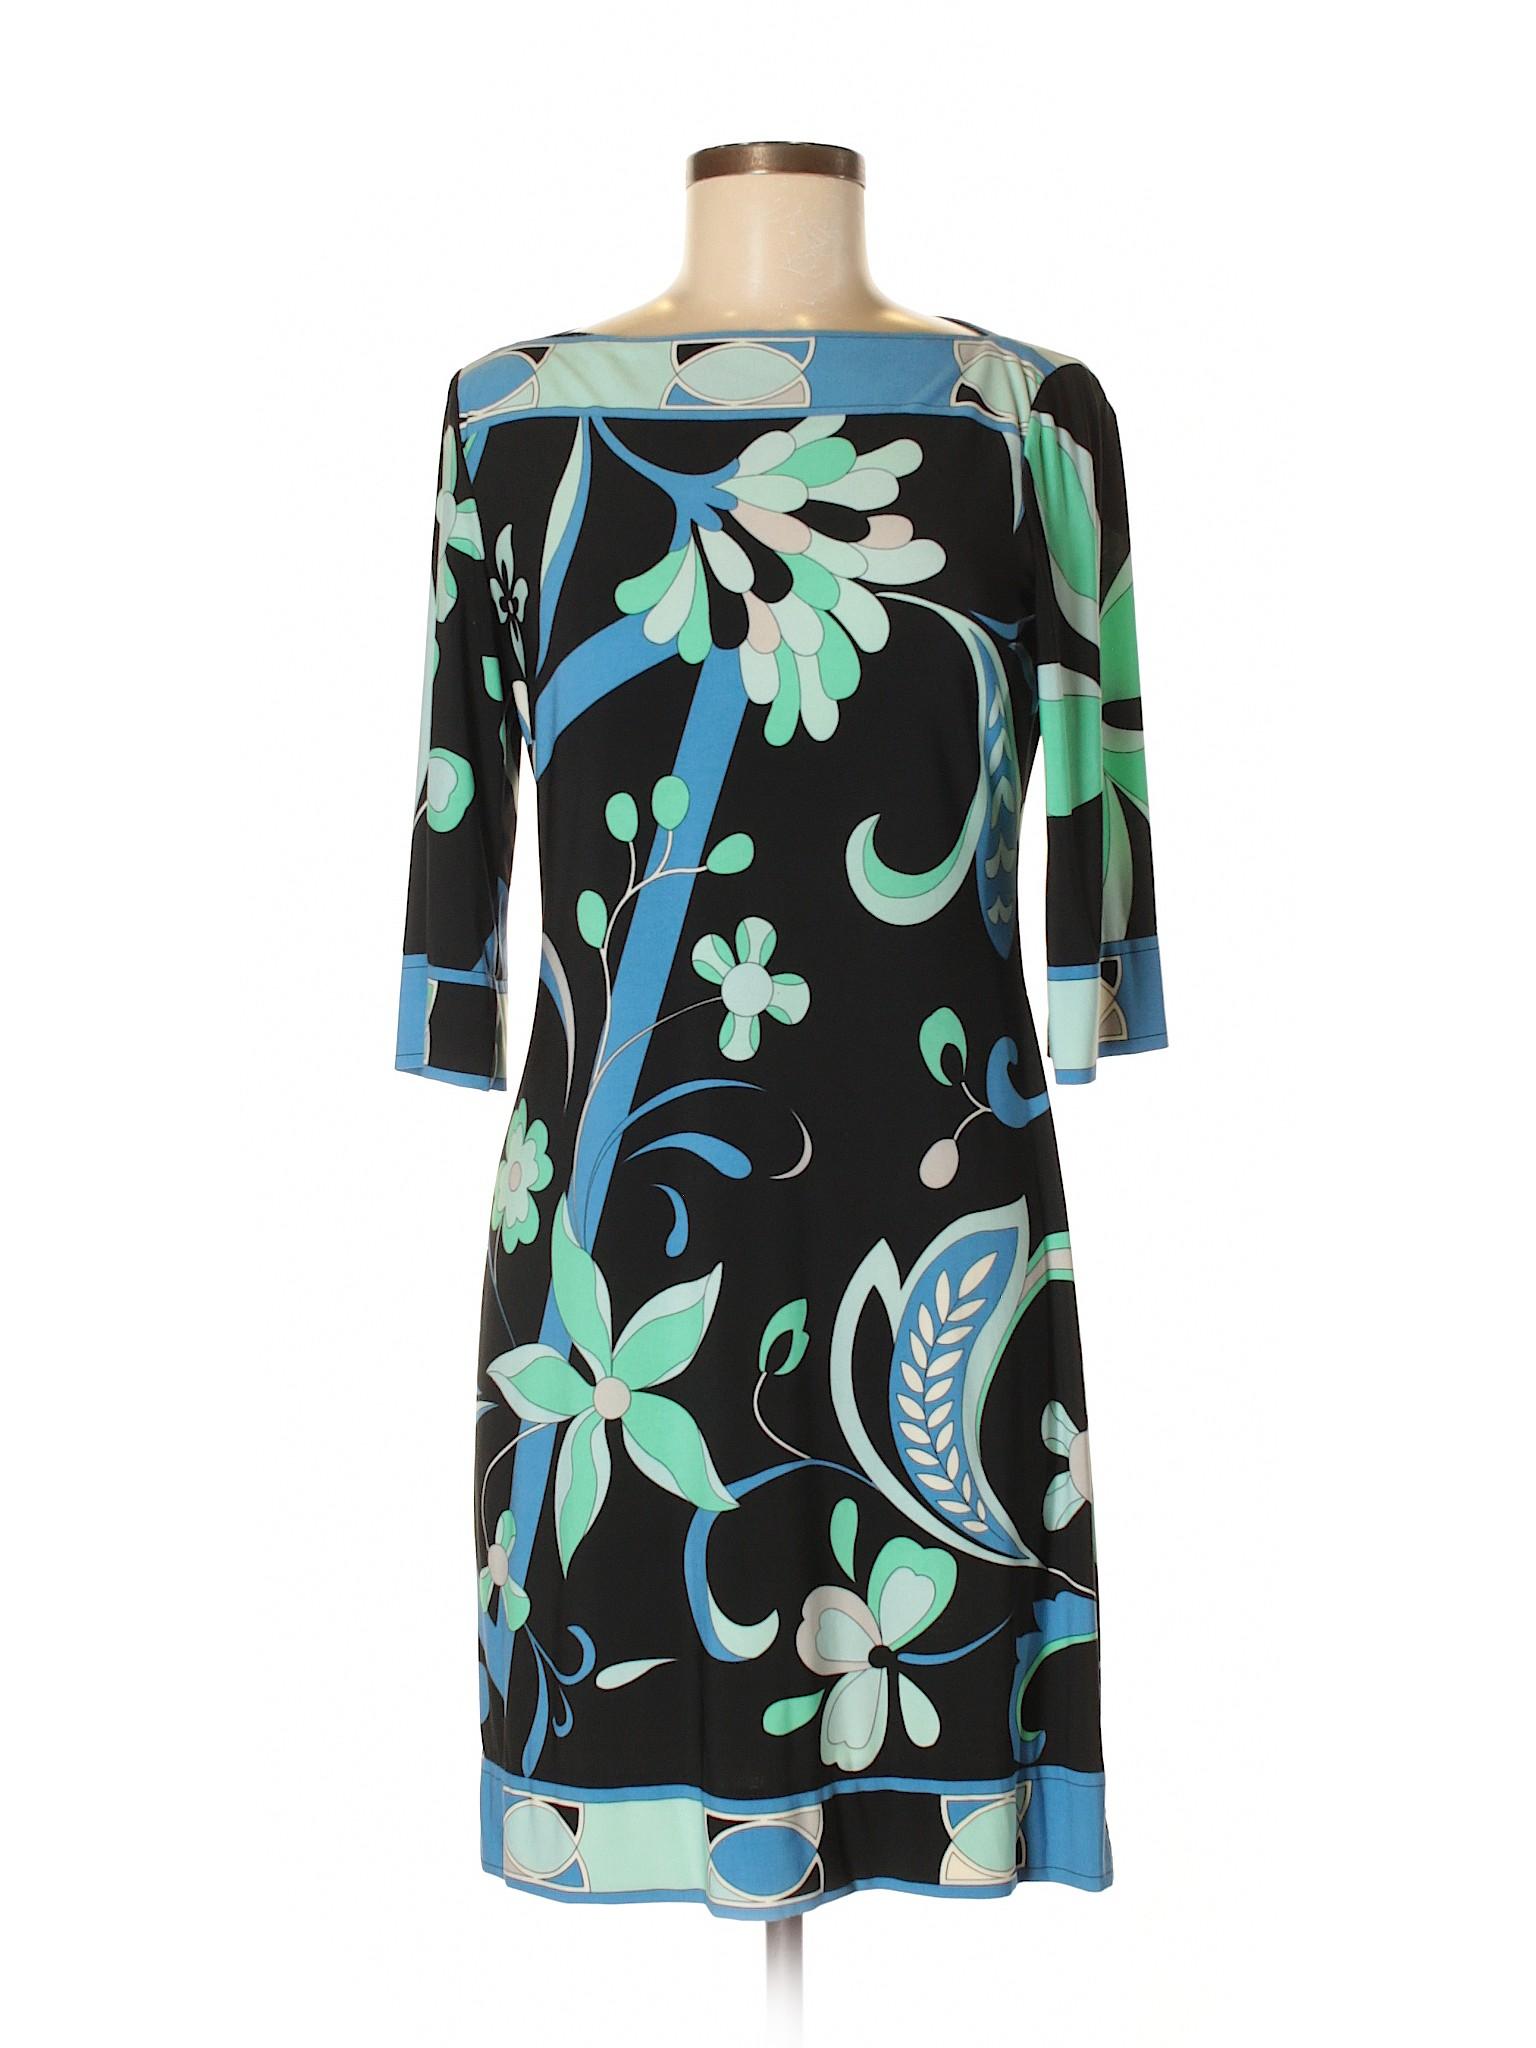 Boutique Casual Casual Boutique Dress Dressbarn Winter Winter Dressbarn Dress wZ4IOq